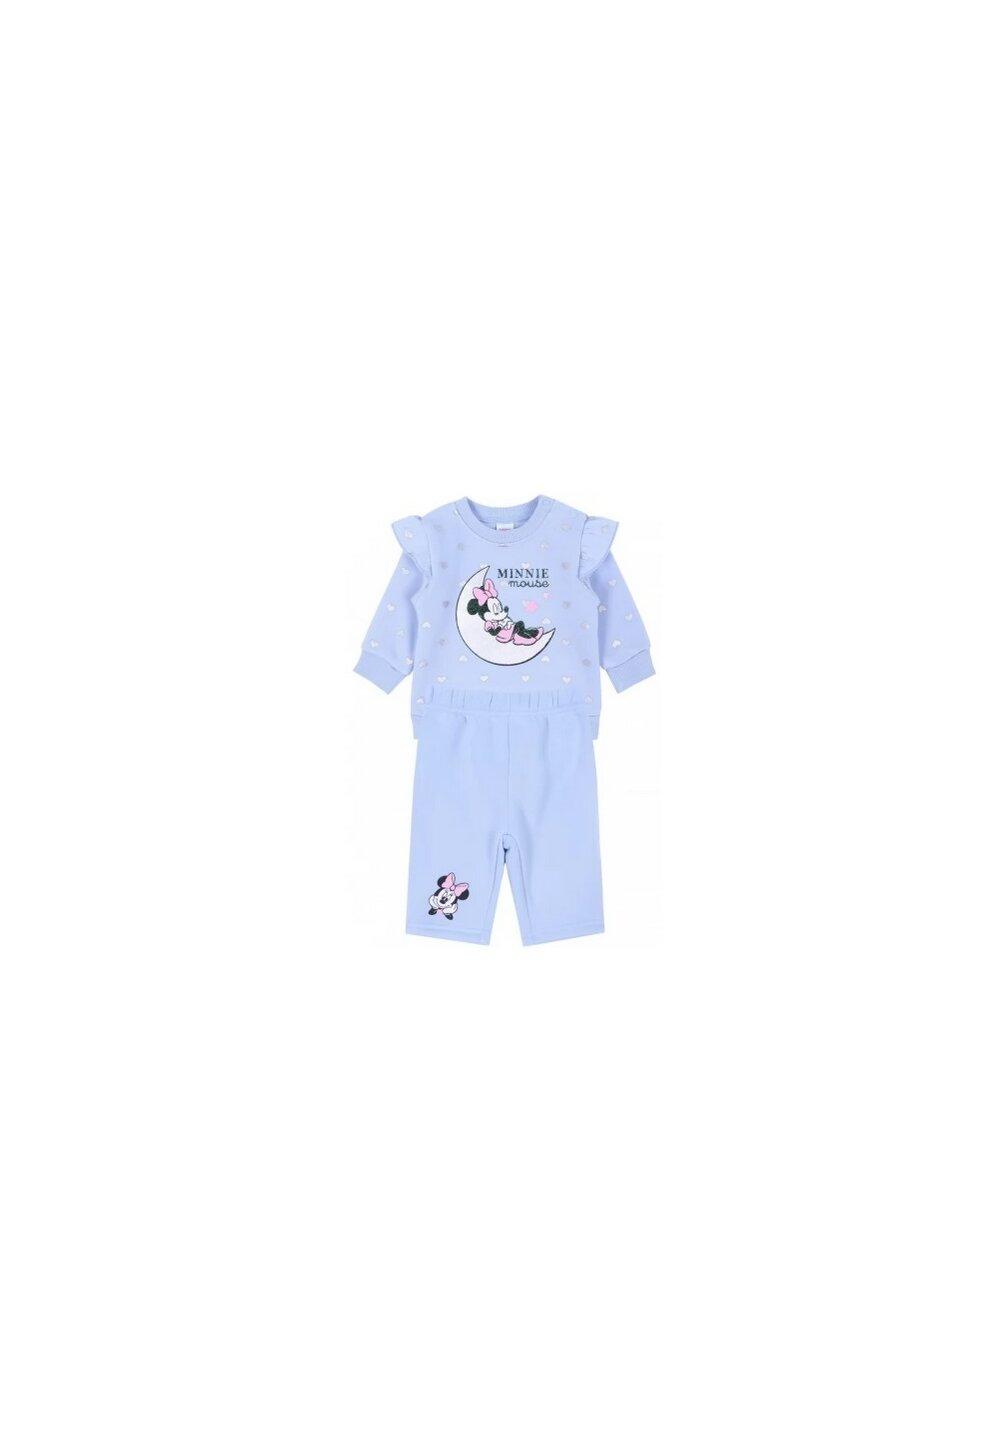 Compleu bebe, Minnie, albastru cu inimioare imagine